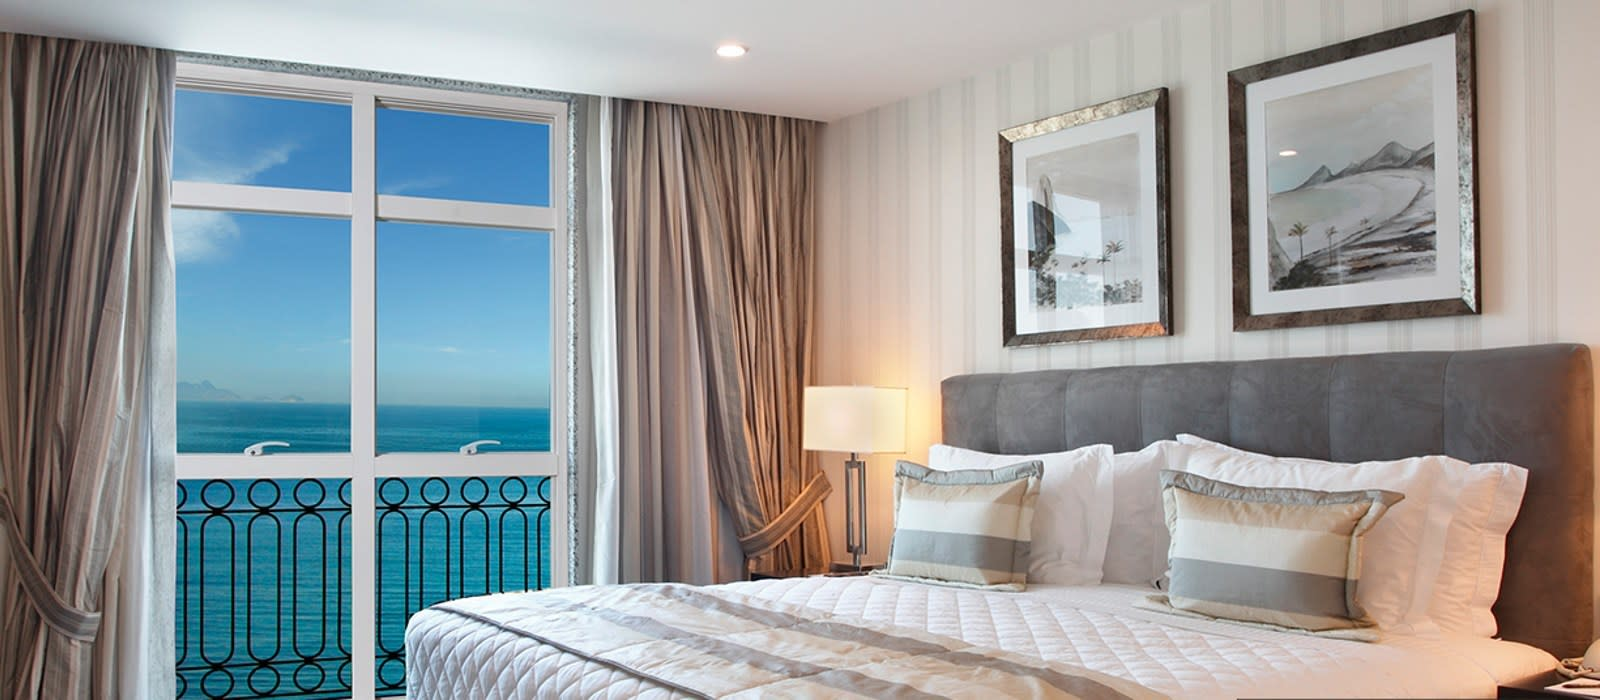 Hotel Miramar  by Windsor Brasilien